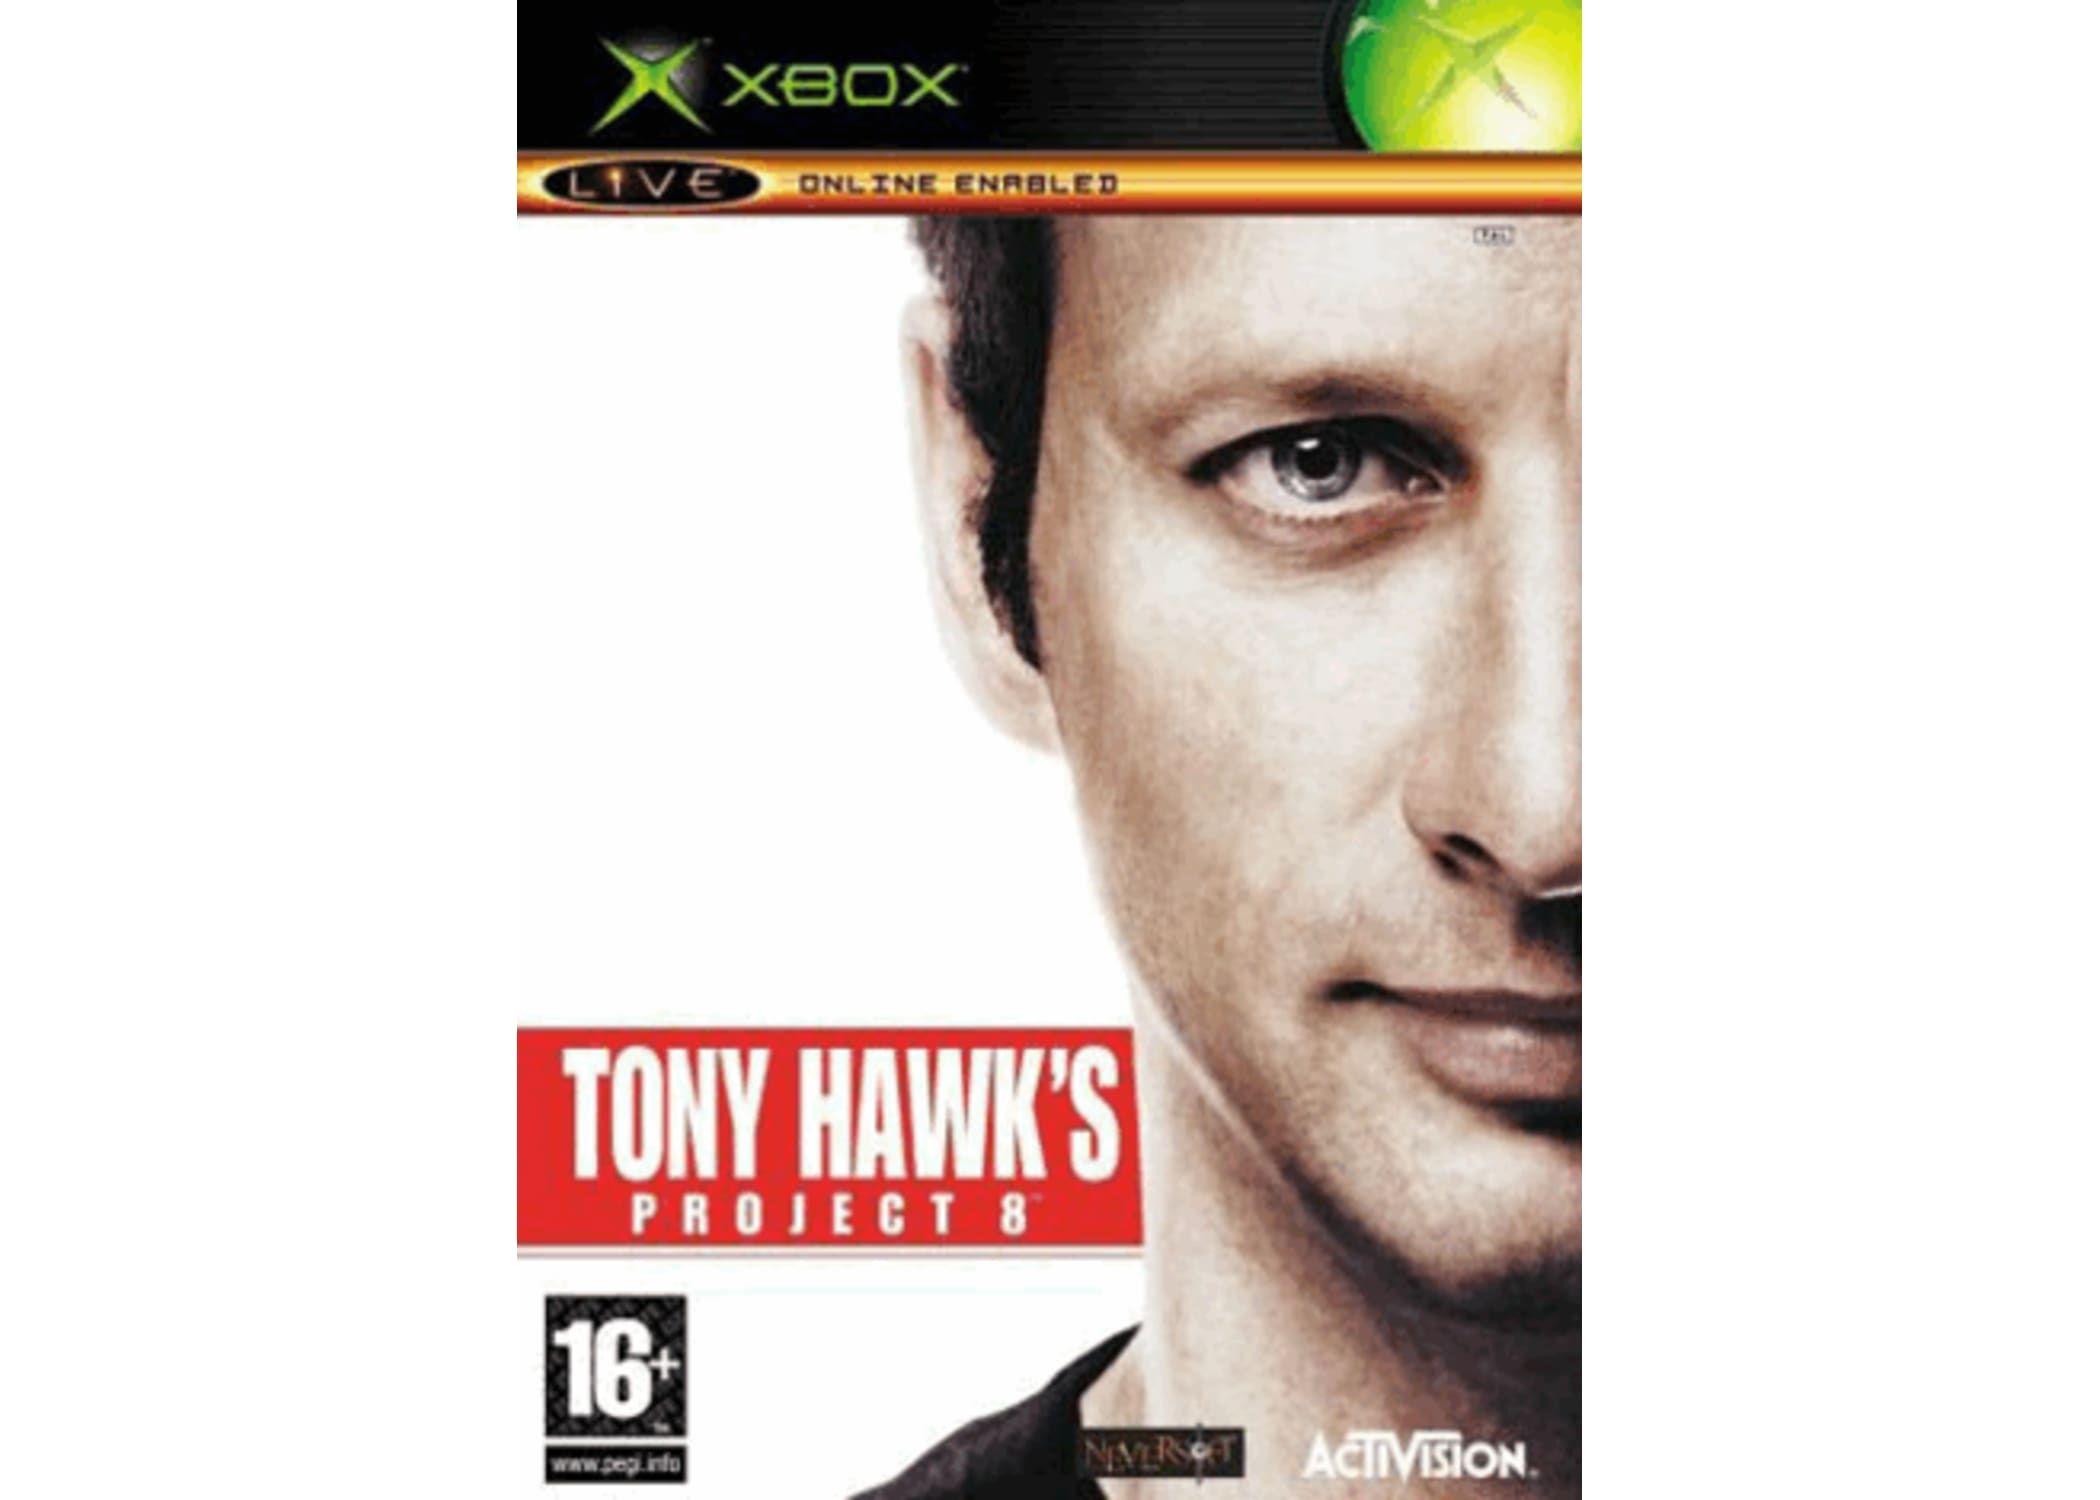 Buy Tony Hawk's Project 8 on Xbox  GAME #Affiliate , #SPONSORED, #Hawk, #Tony, #Buy, #GAME, #Xbox